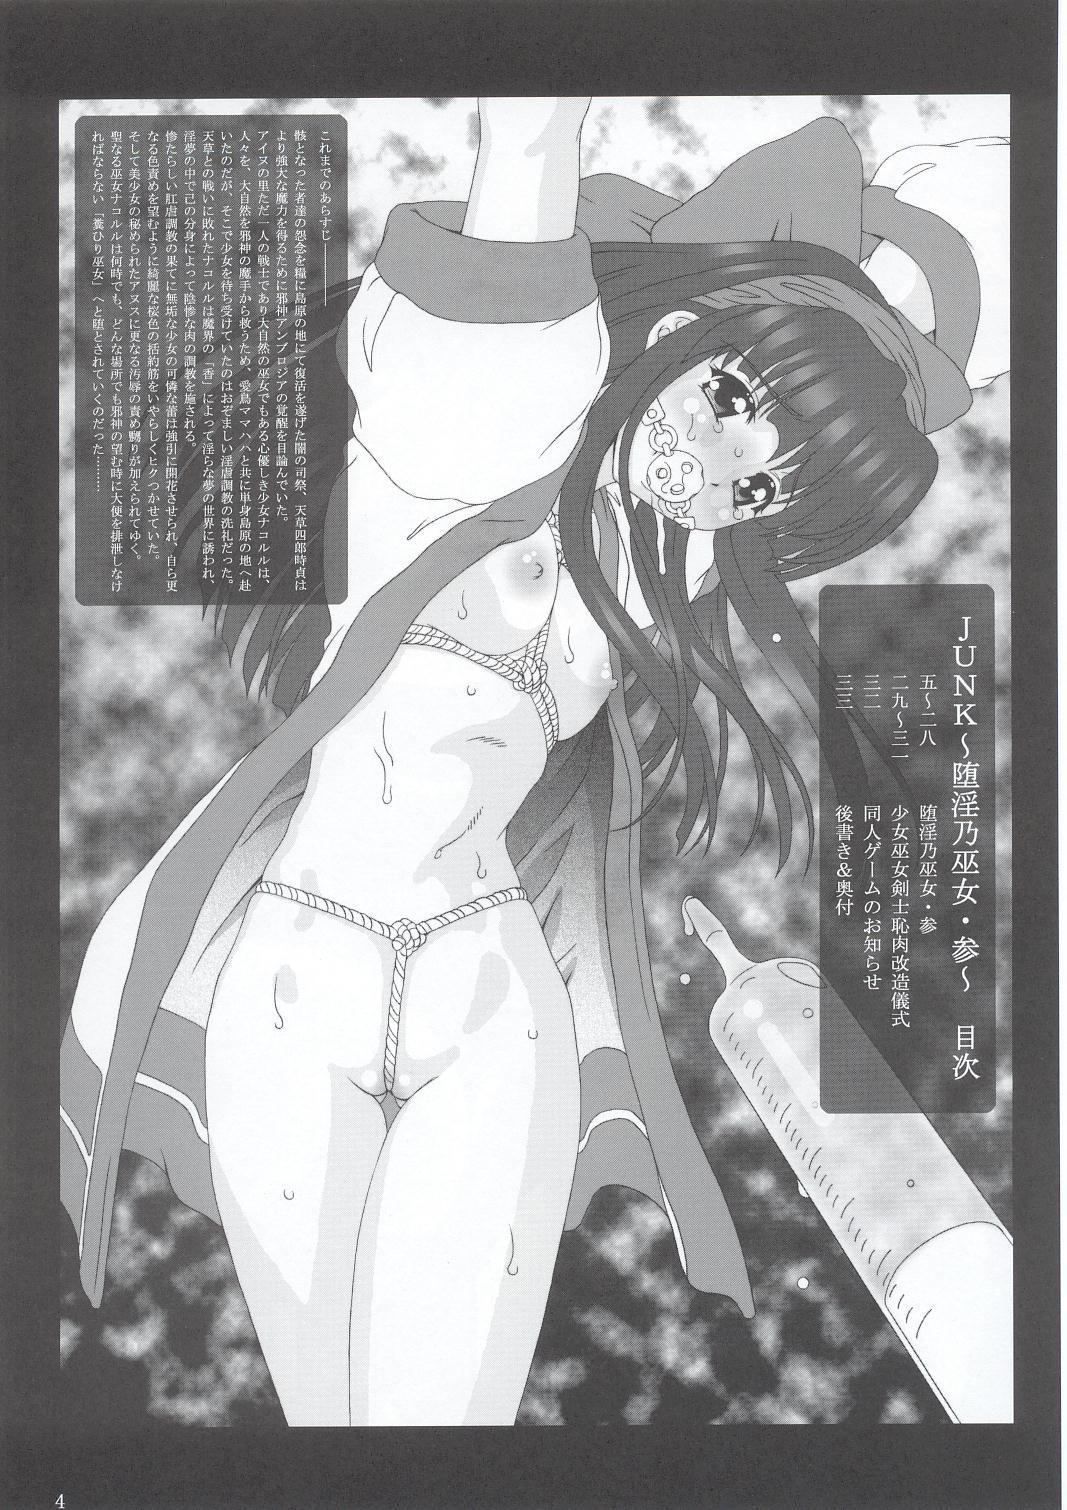 JUNK Dain no Miko San 2